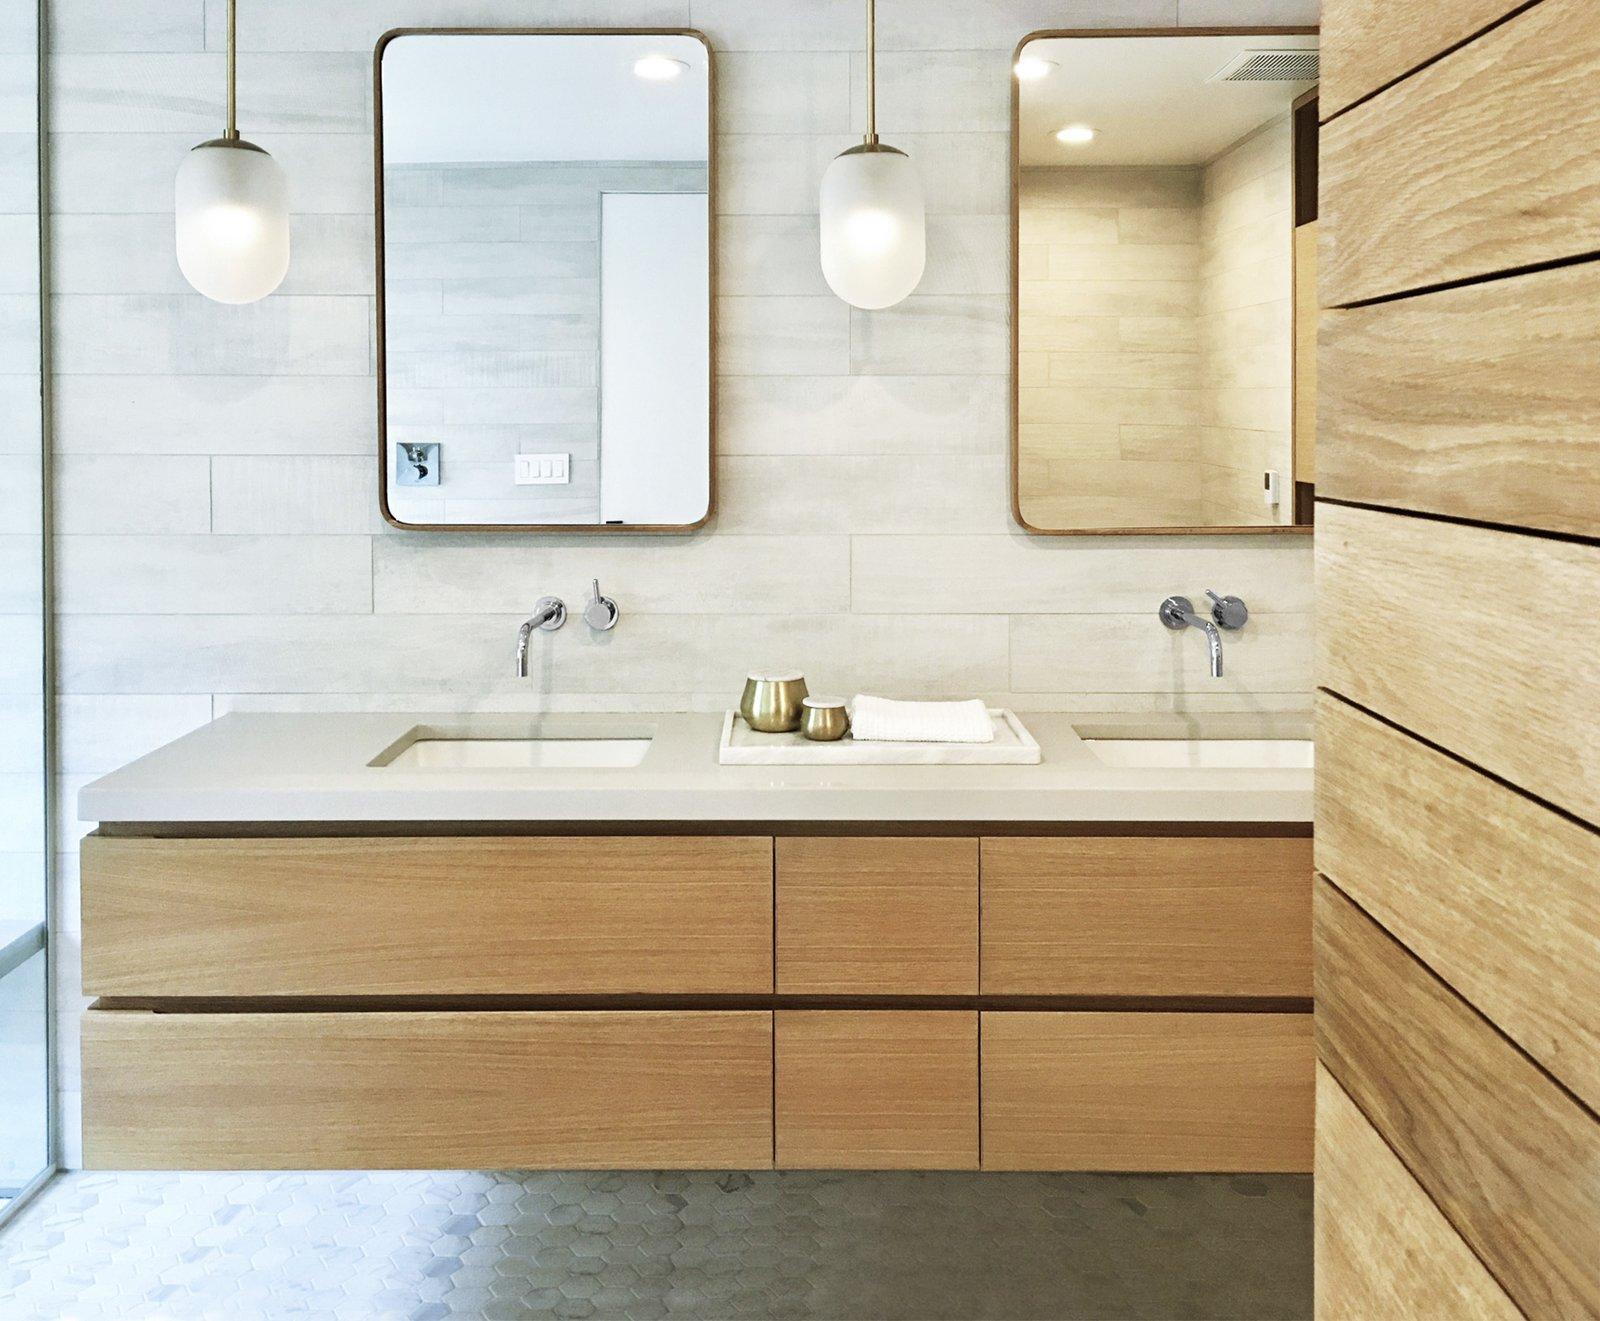 Bath, Undermount, Pendant, Porcelain Tile, Engineered Quartz, and Ceramic Tile  Bath Engineered Quartz Ceramic Tile Pendant Photos from 8 Svelte Kitchens and Baths We Love From Instagram